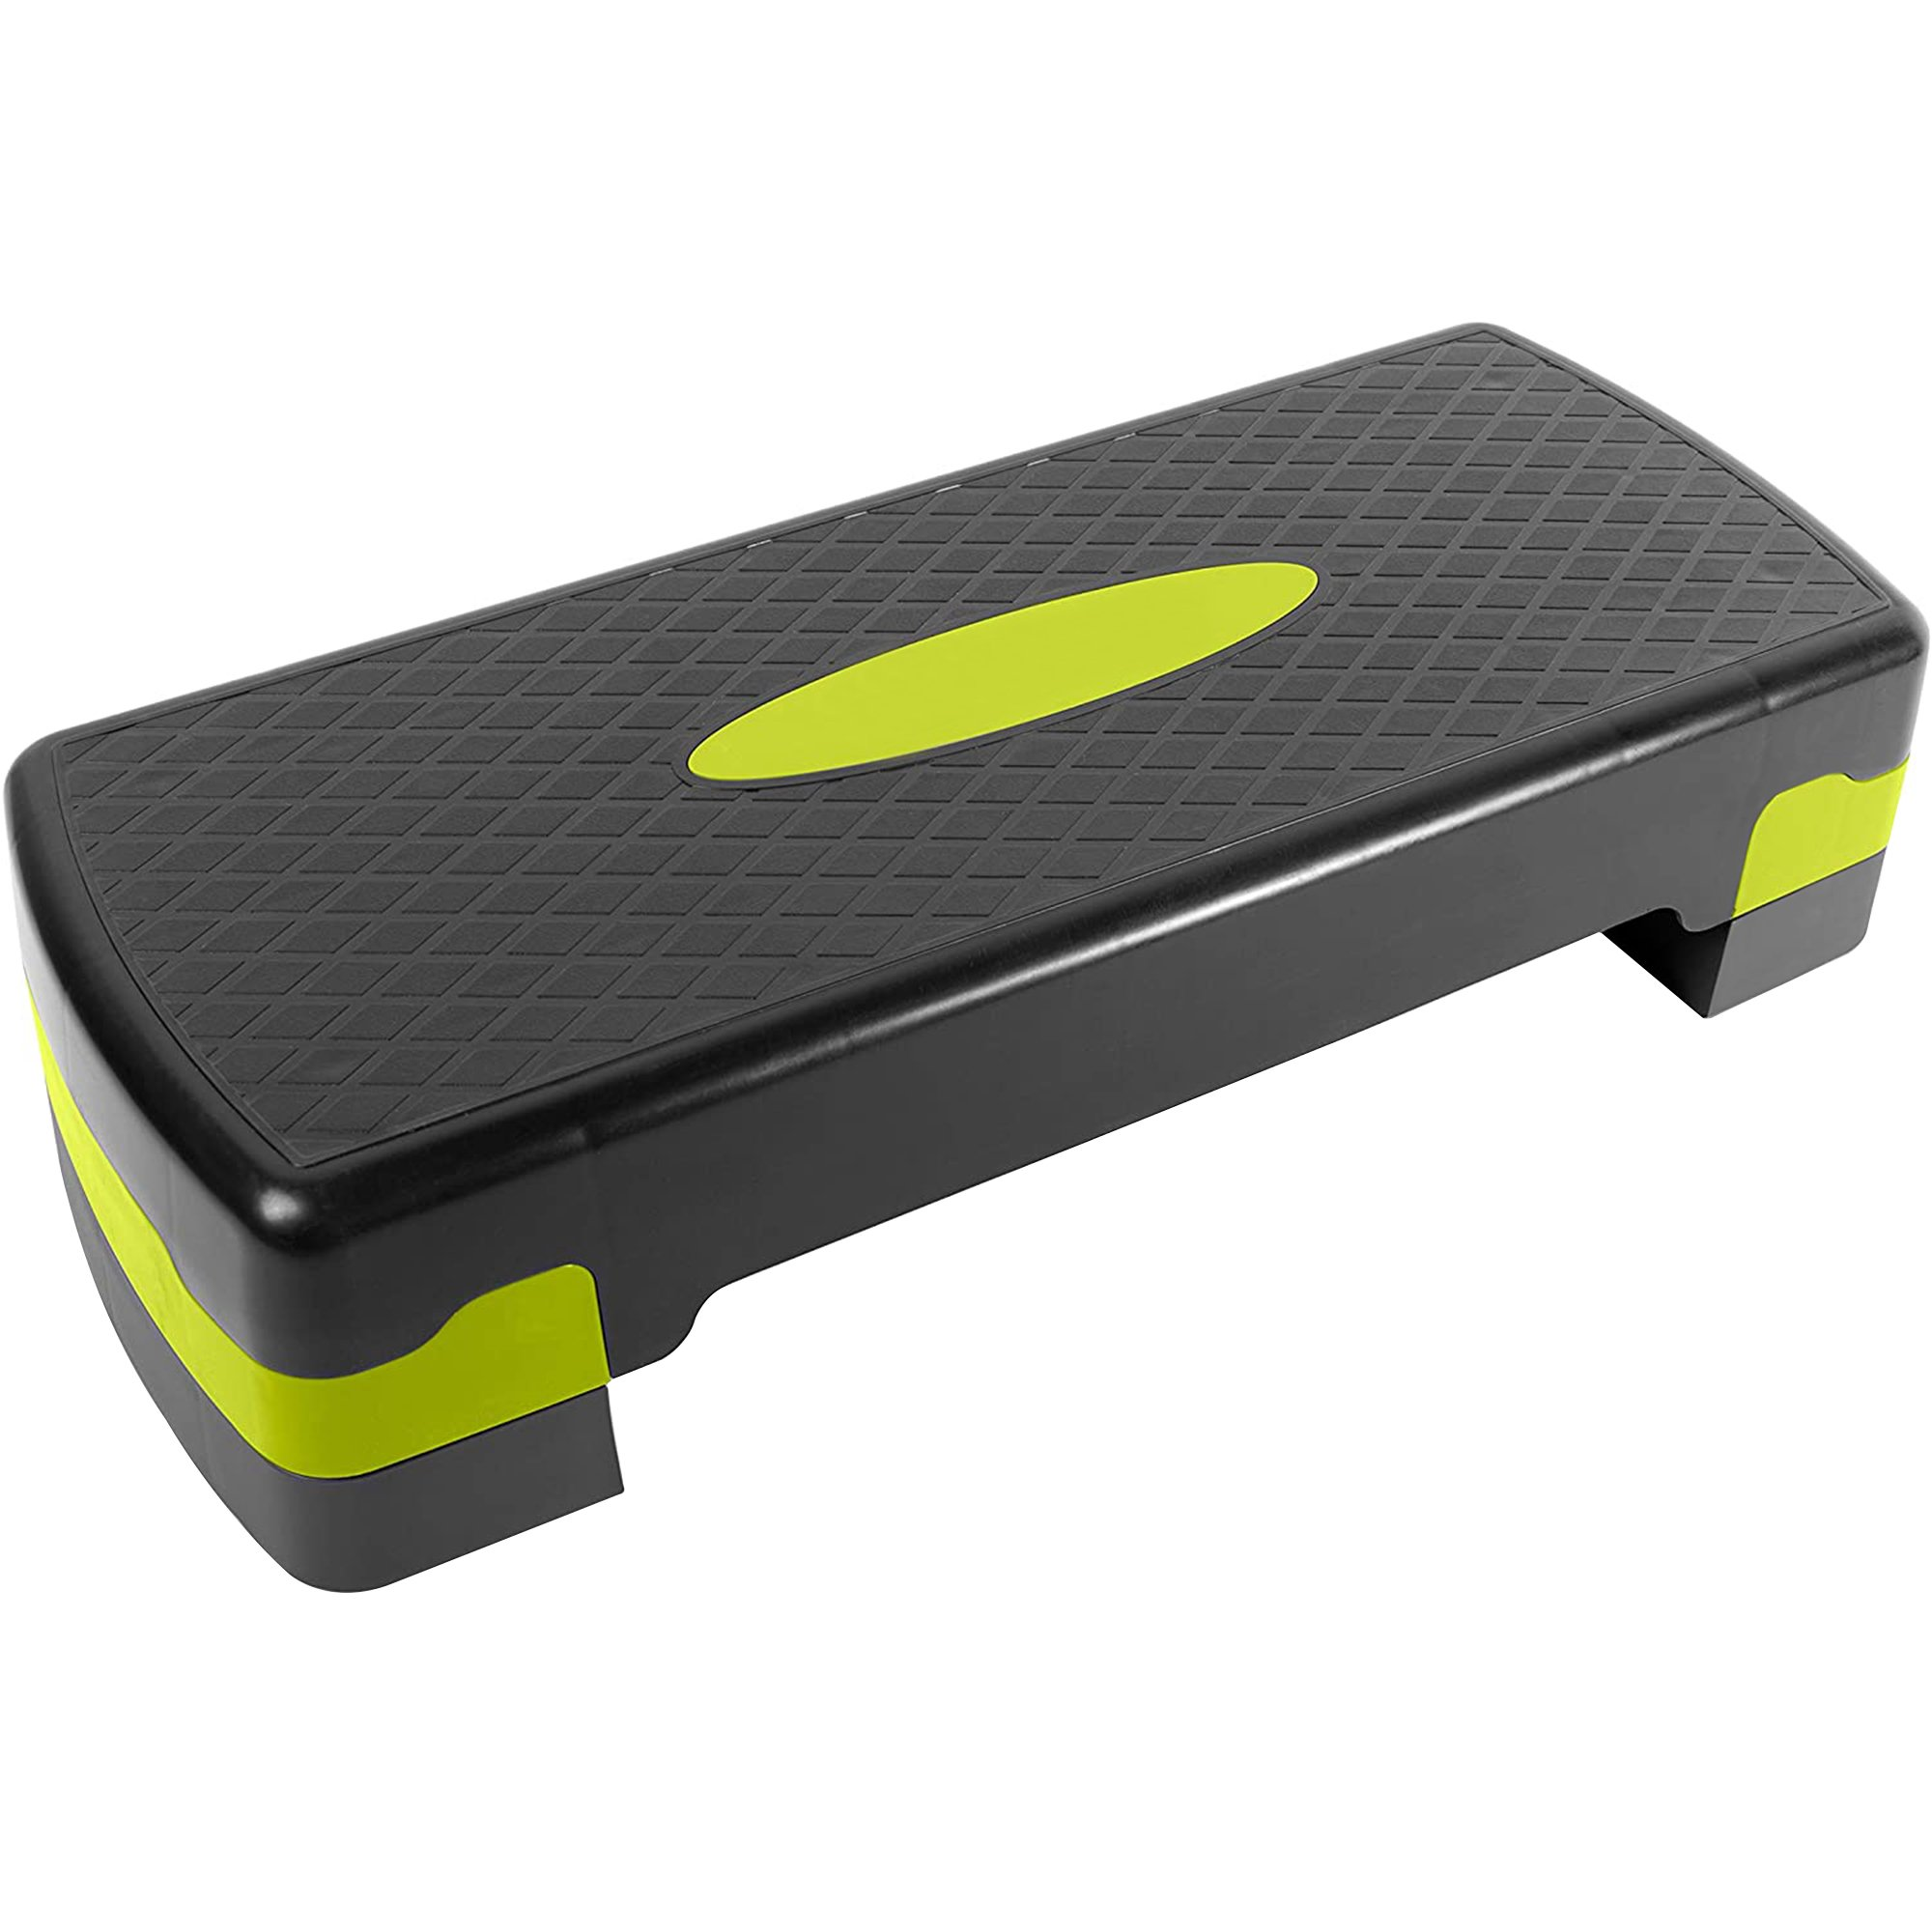 Adjustable Aerobic Workout Step